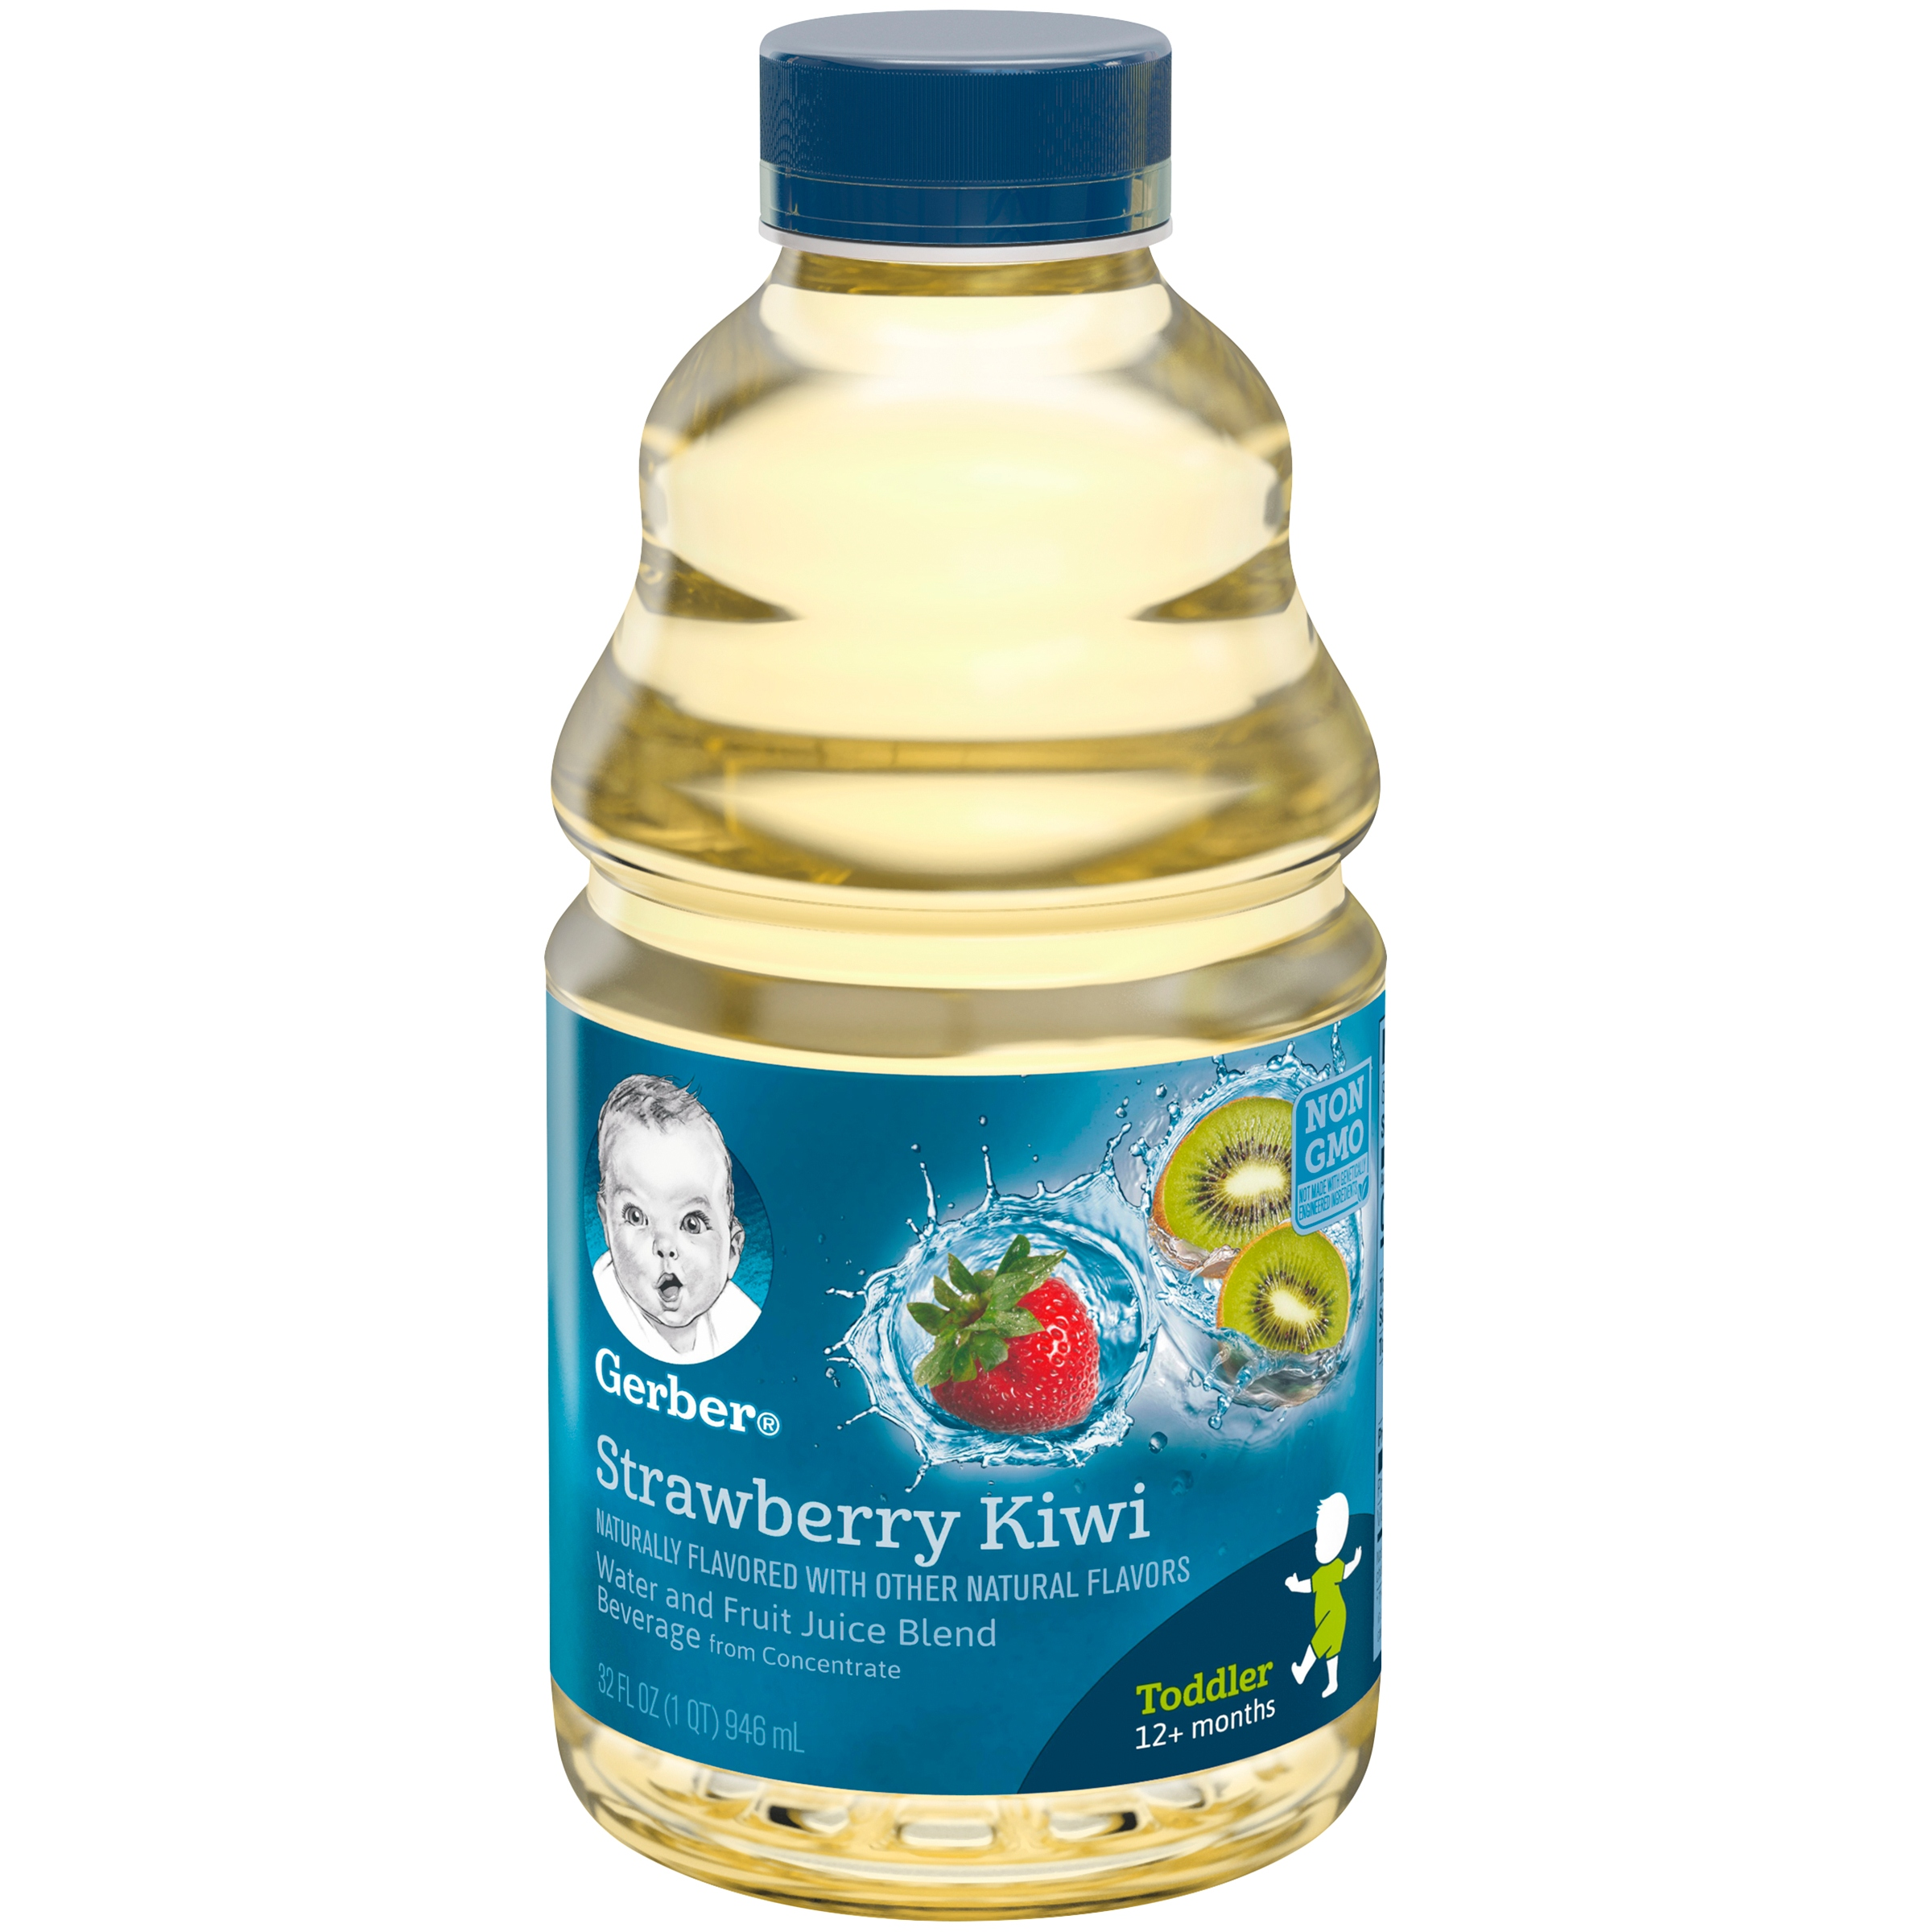 Gerber Fruit Splashers Strawberry Kiwi Beverage 32 fl. oz. Bottle